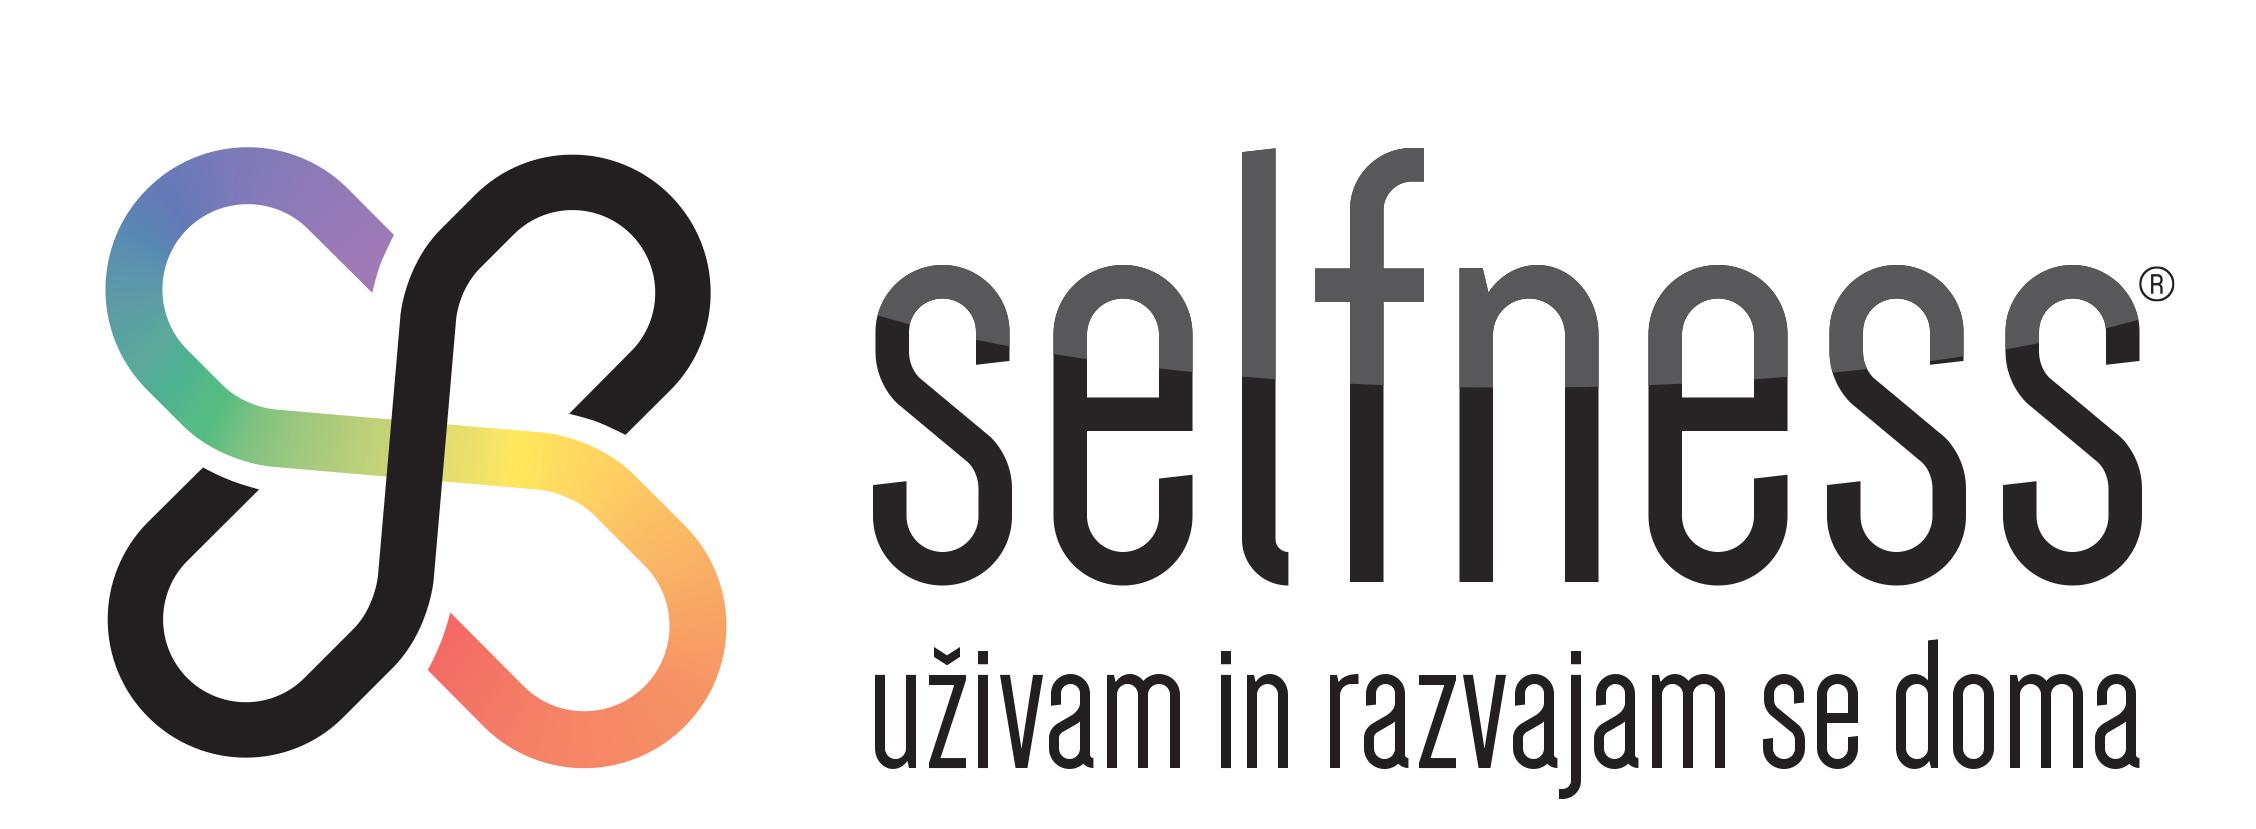 logo_desno_slogan_2016